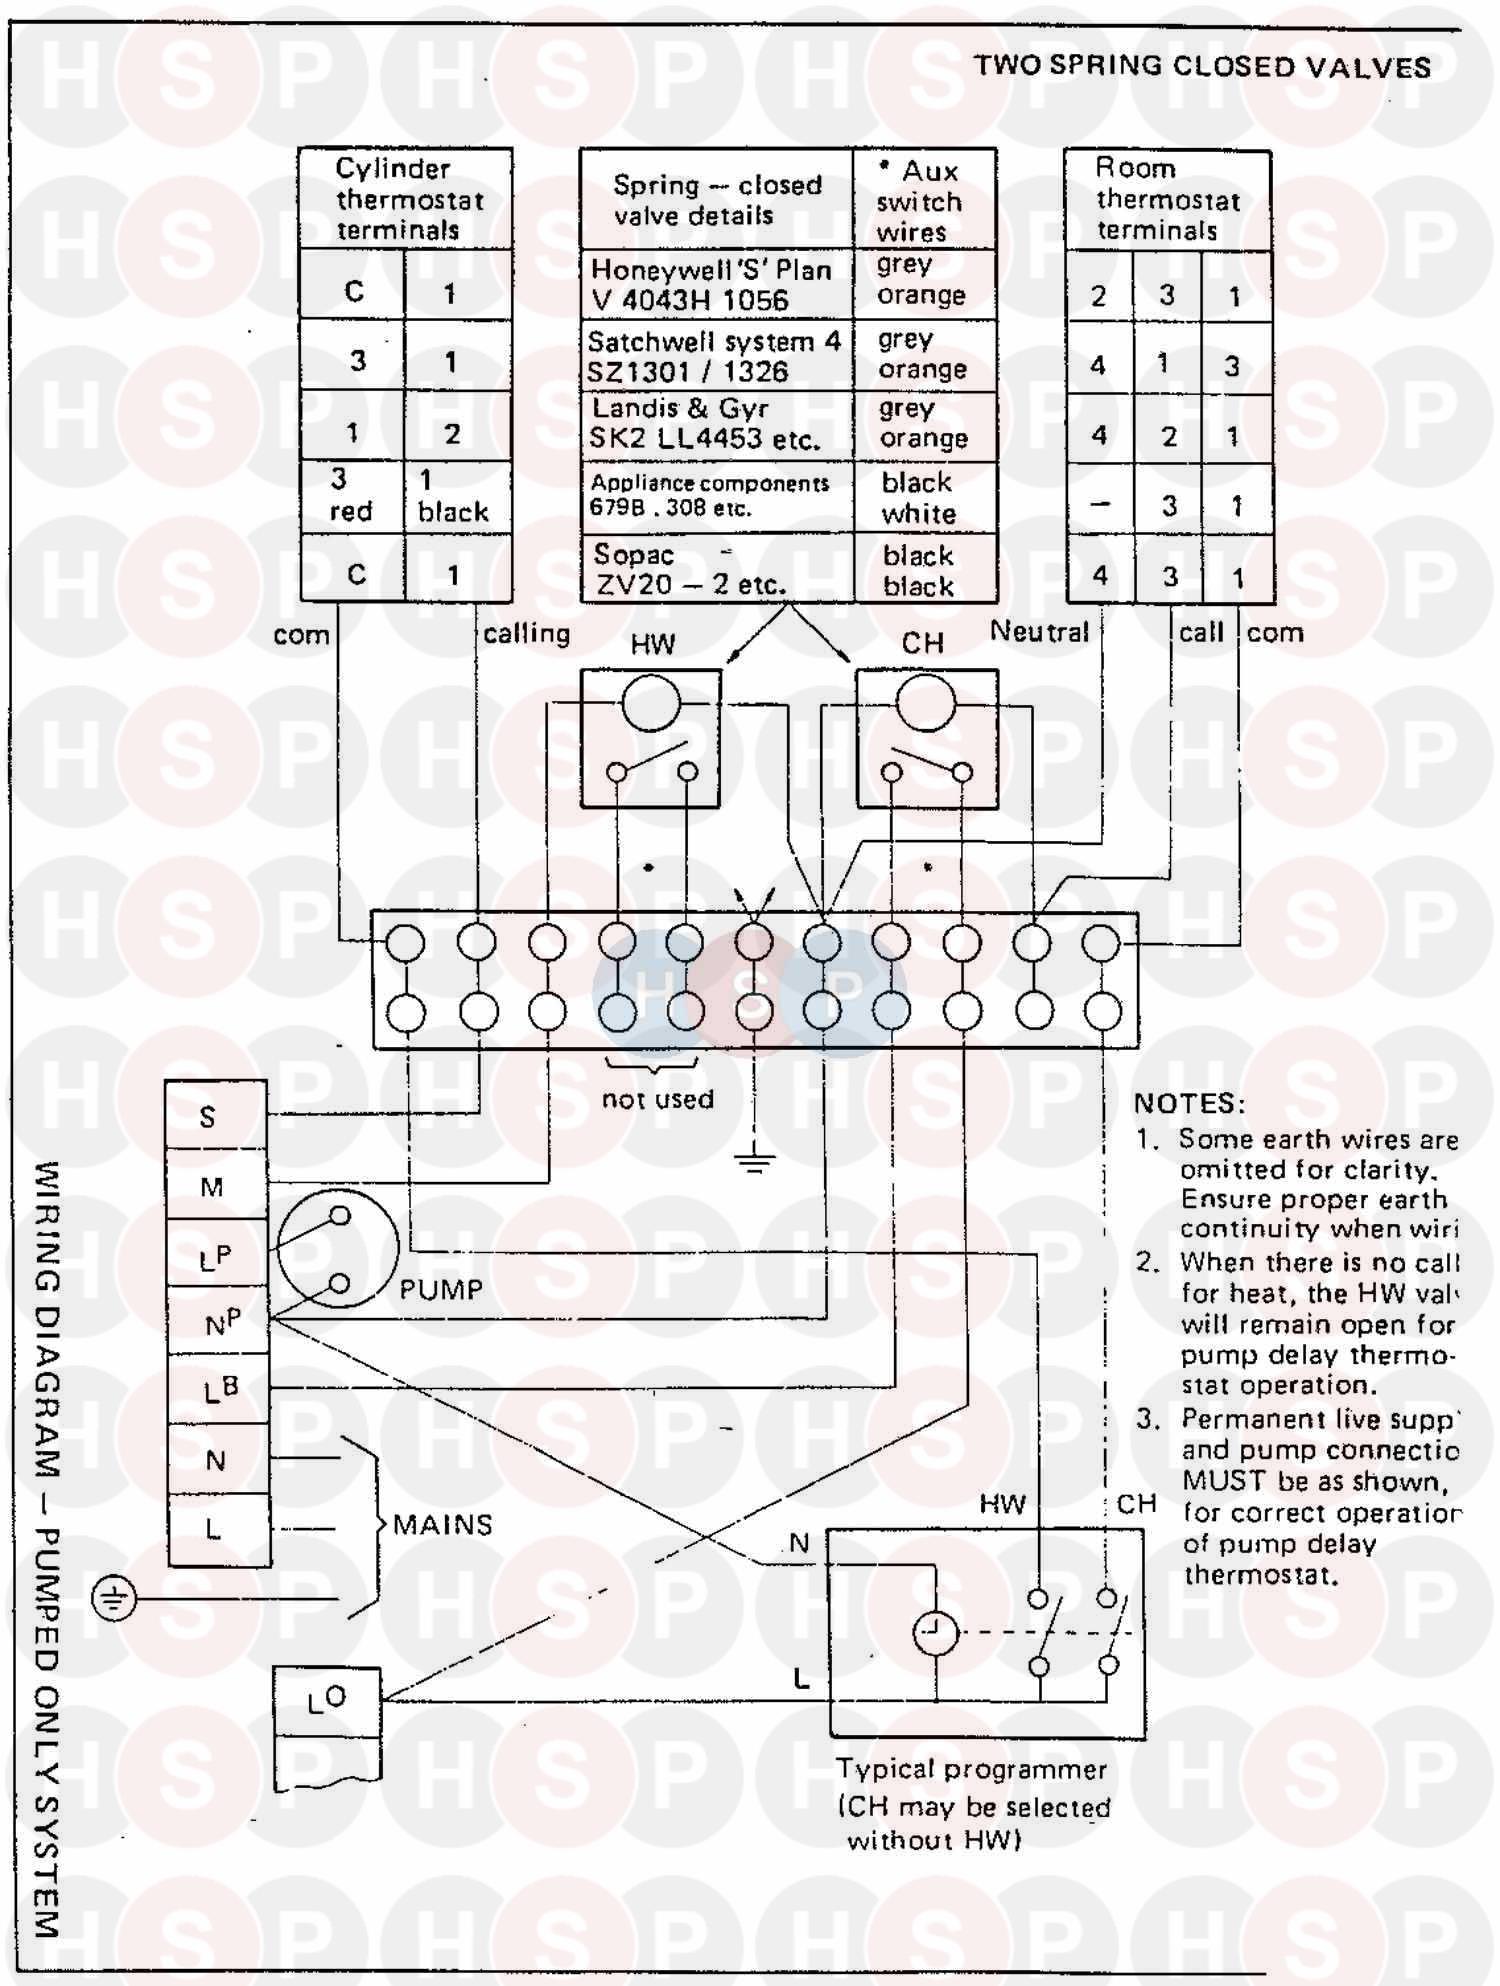 F116 Cf Wiring Diagrams | Wiring Resources Cf Wiring Diagrams on ar diagram, cd diagram, er diagram, ph diagram, tv diagram,